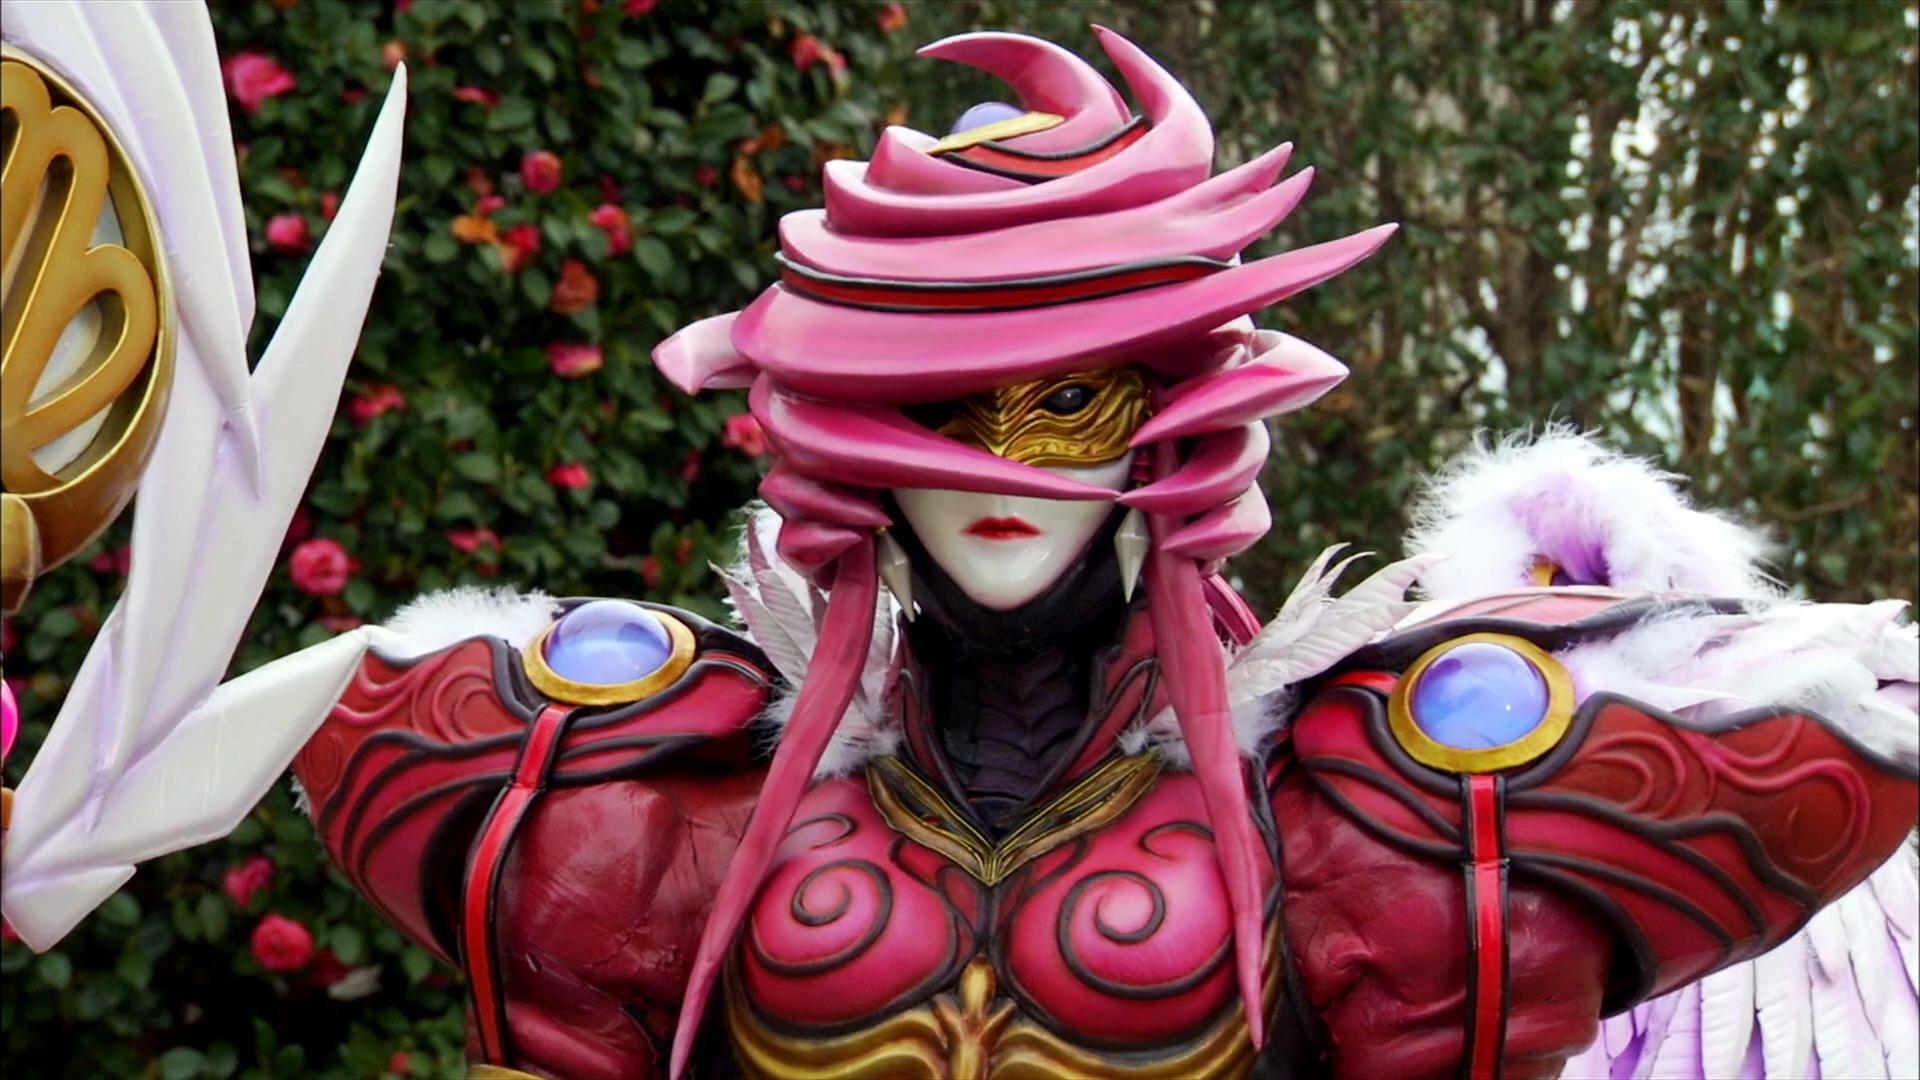 Kuniteru Emoto | Kamen Rider Wiki | FANDOM powered by Wikia